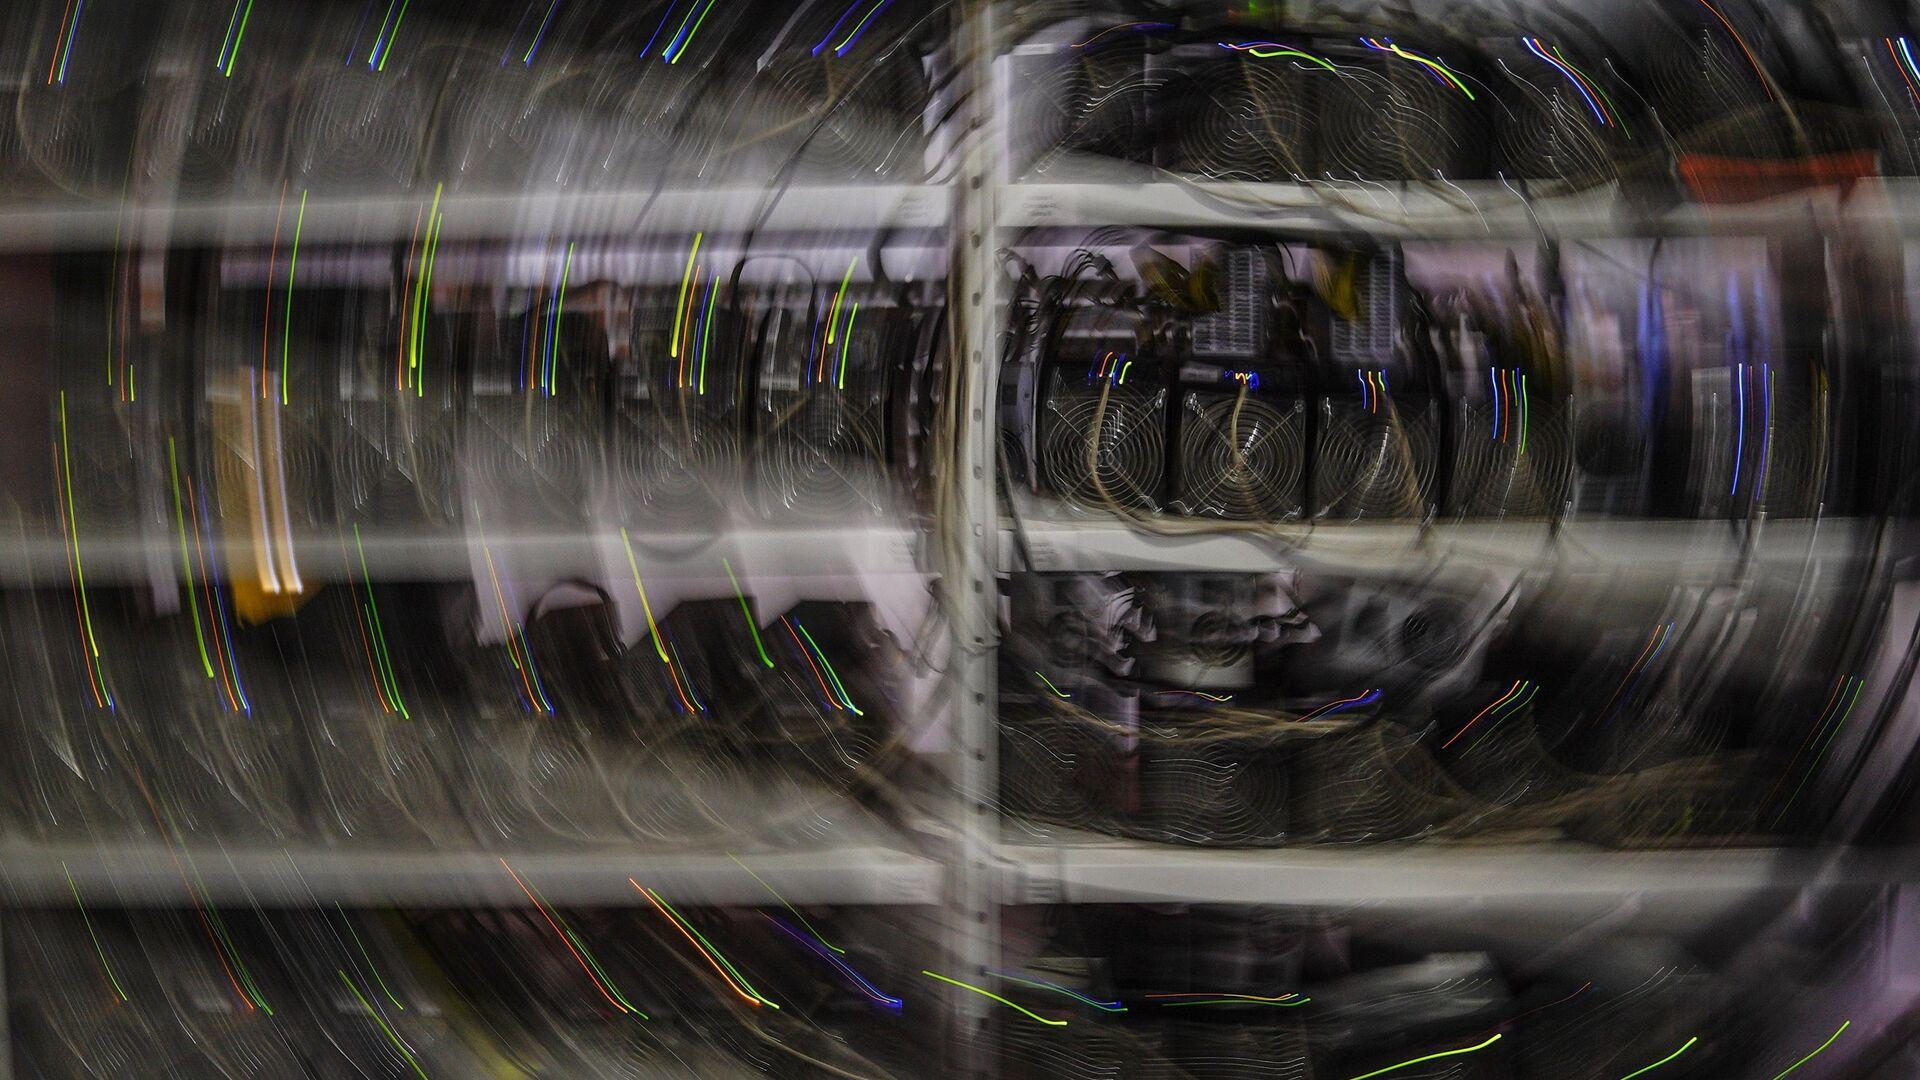 Пандемия ударила рублем: производители взвинтили цены на электронику